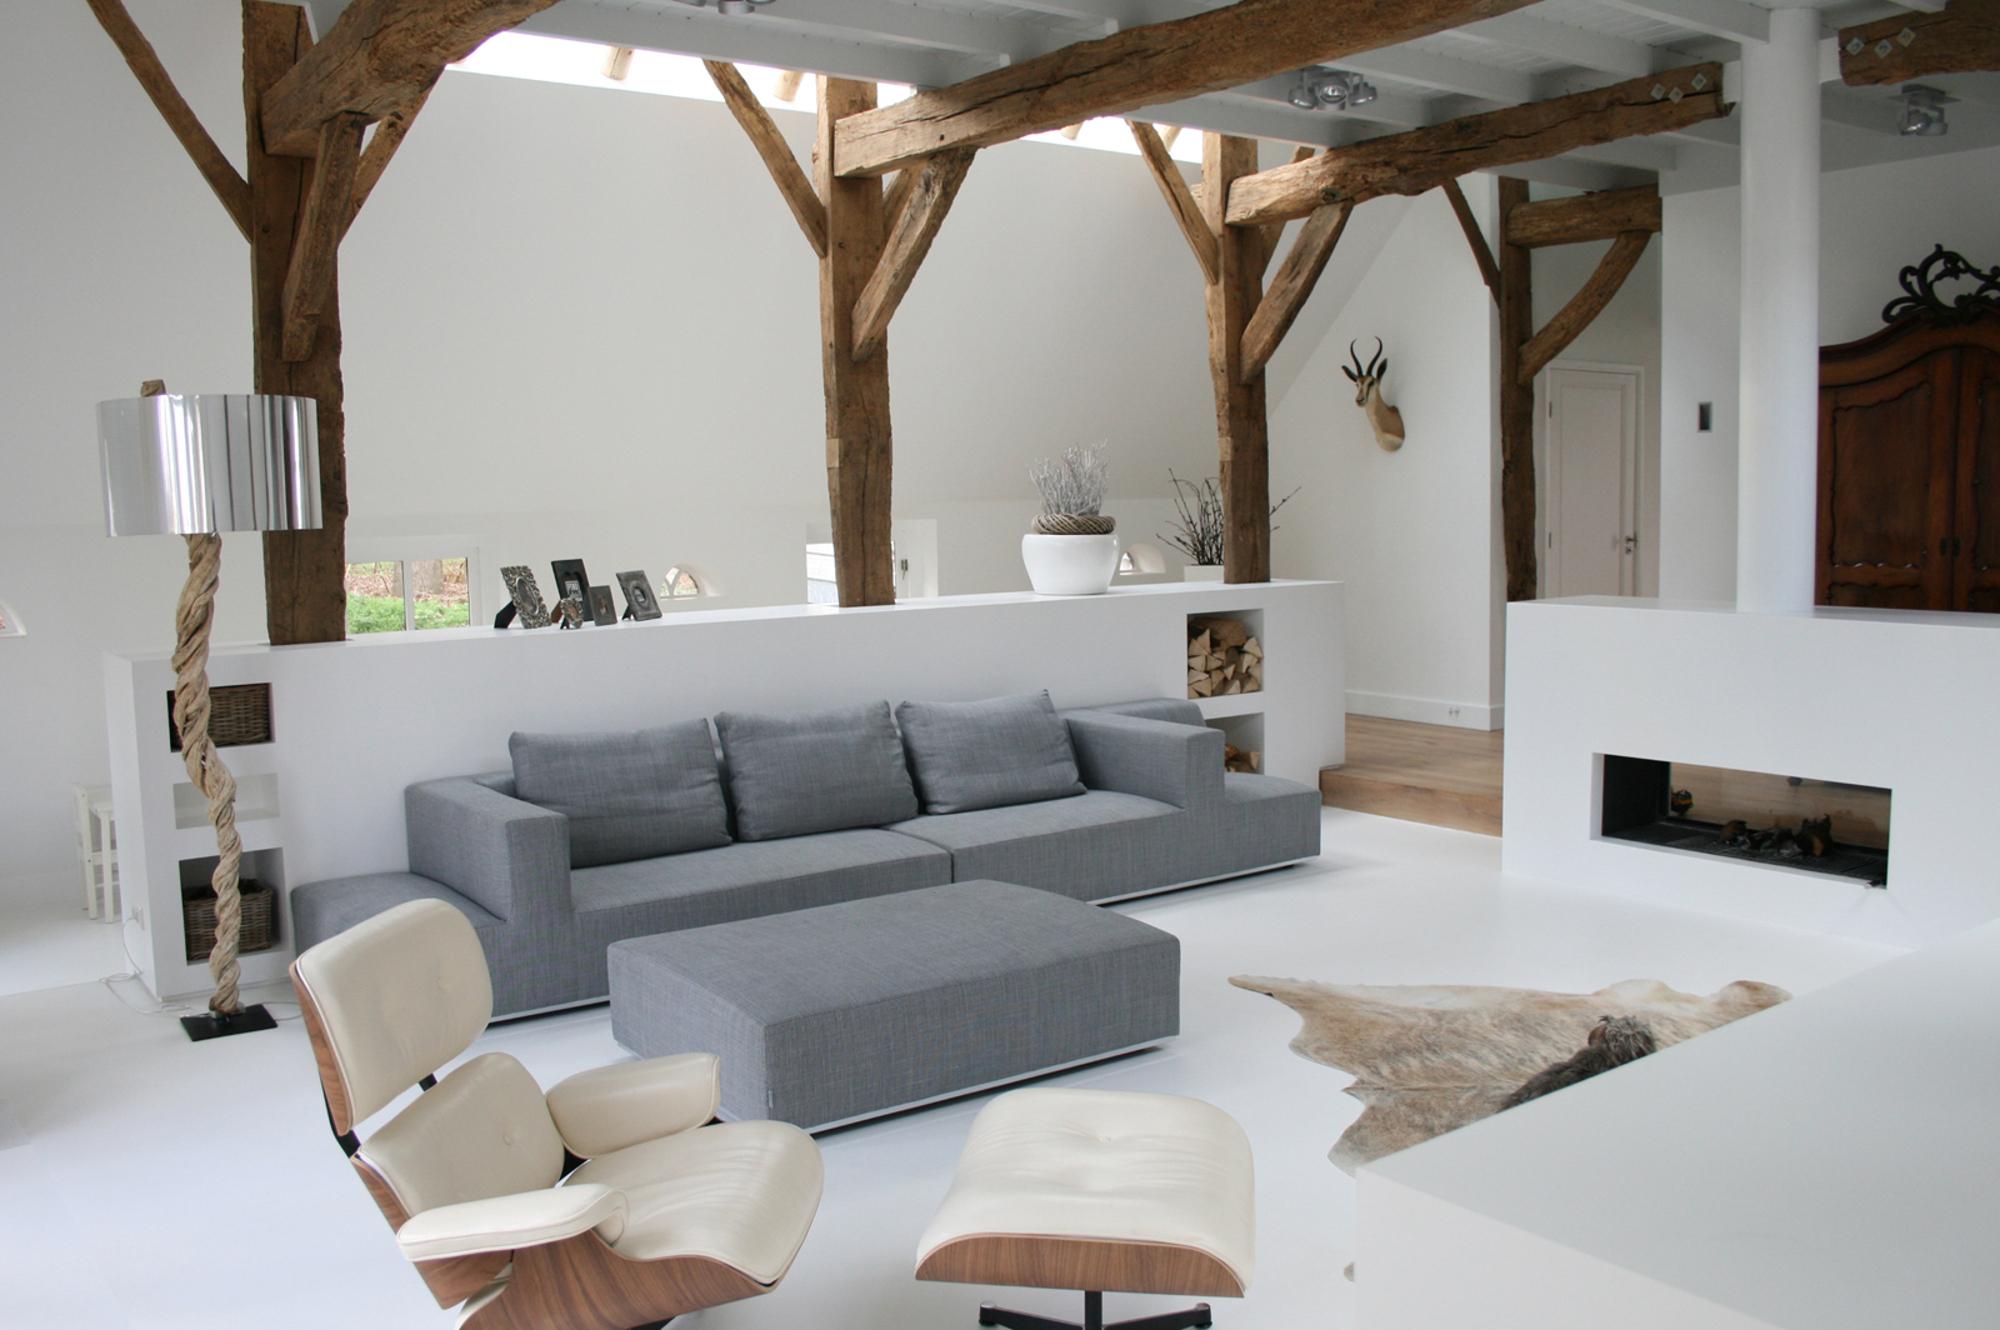 Vide In Huis : Wanddecoratie hout zelf maken interieur meubilair ideeën